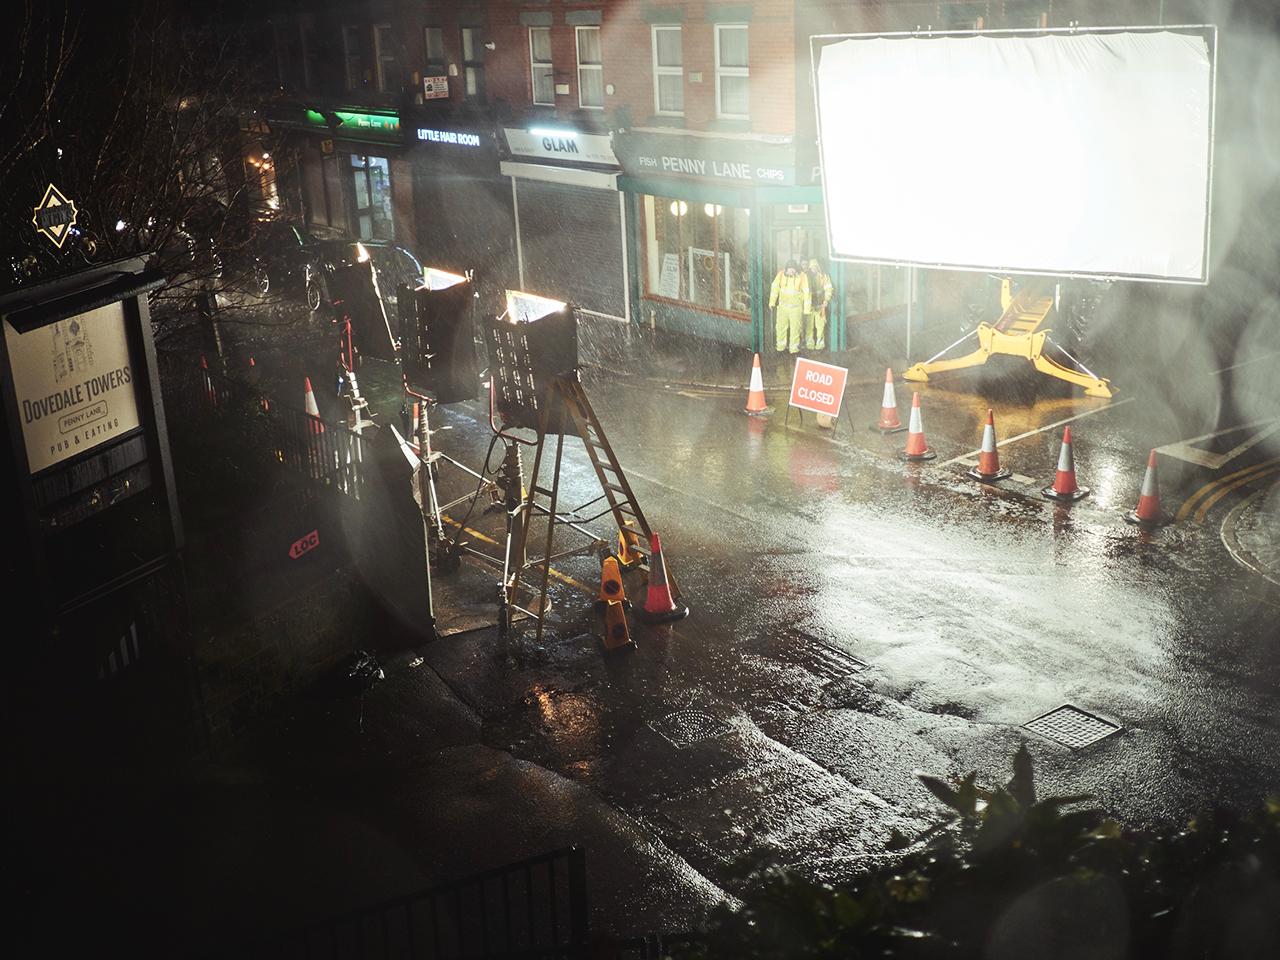 filmset-stadt-filmproduktion-international-filmer